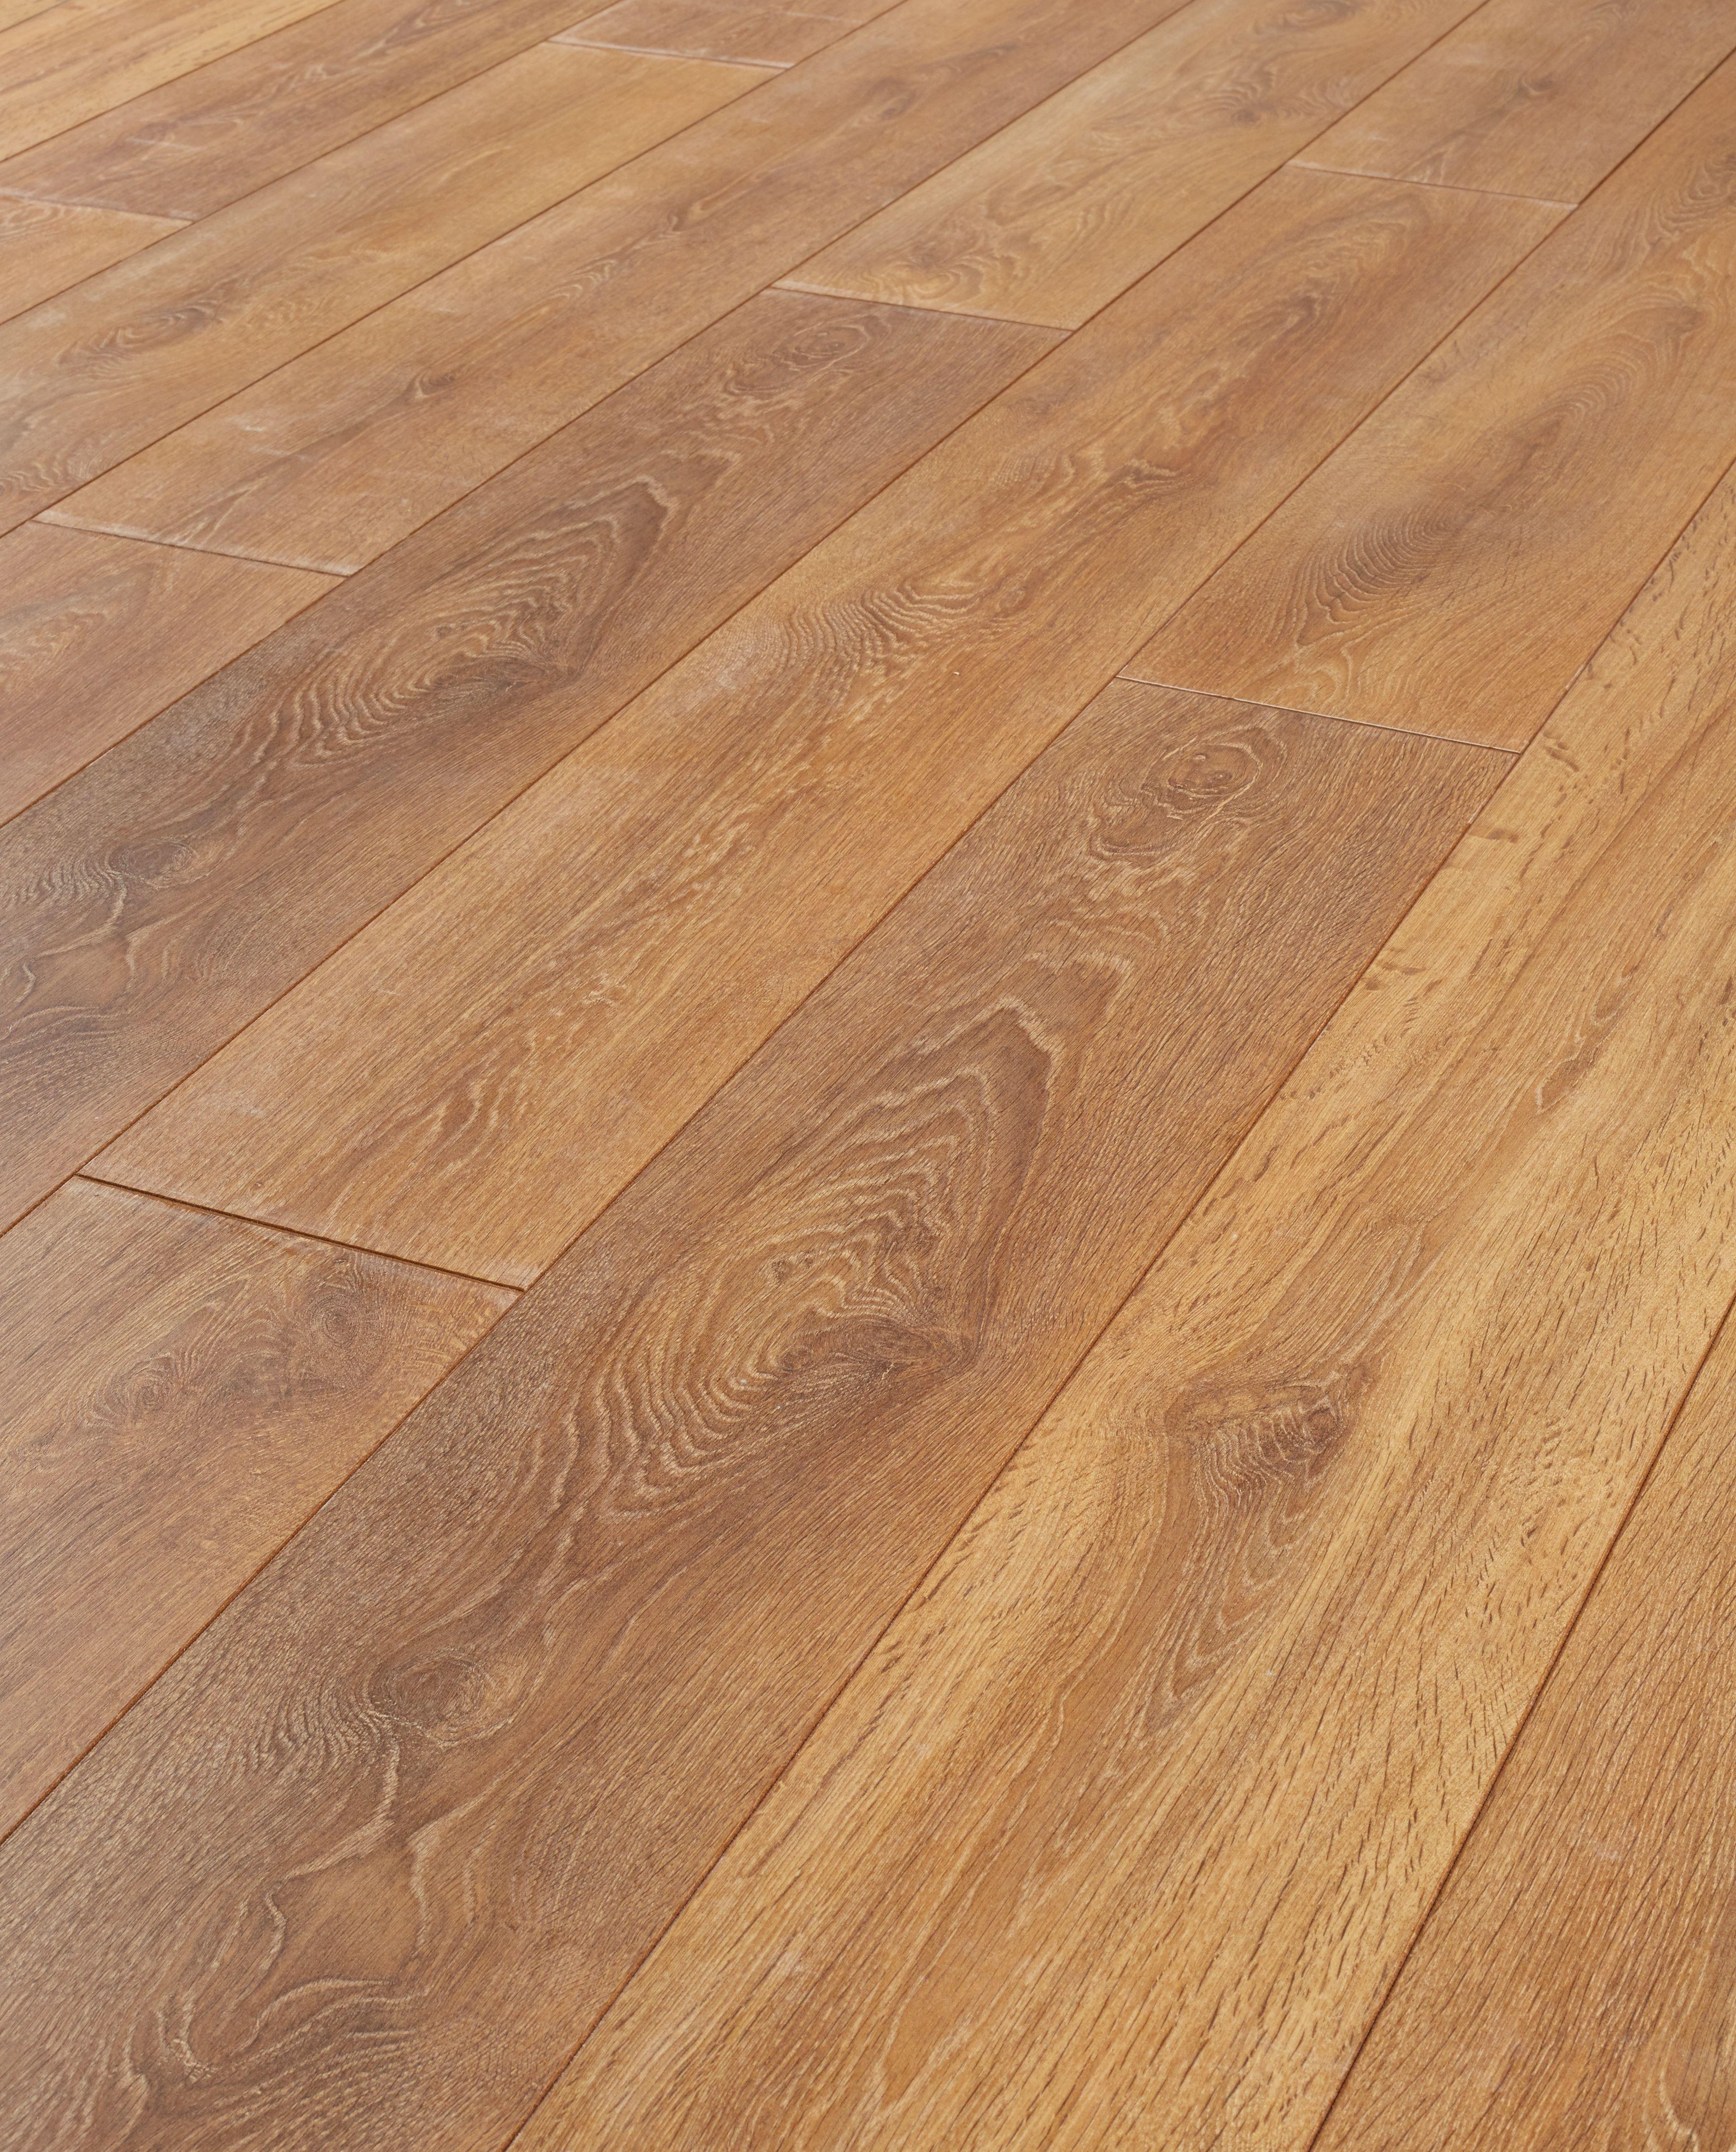 Wickes Aspiran Oak Laminate Flooring 2 22m2 Pack Wood Laminate